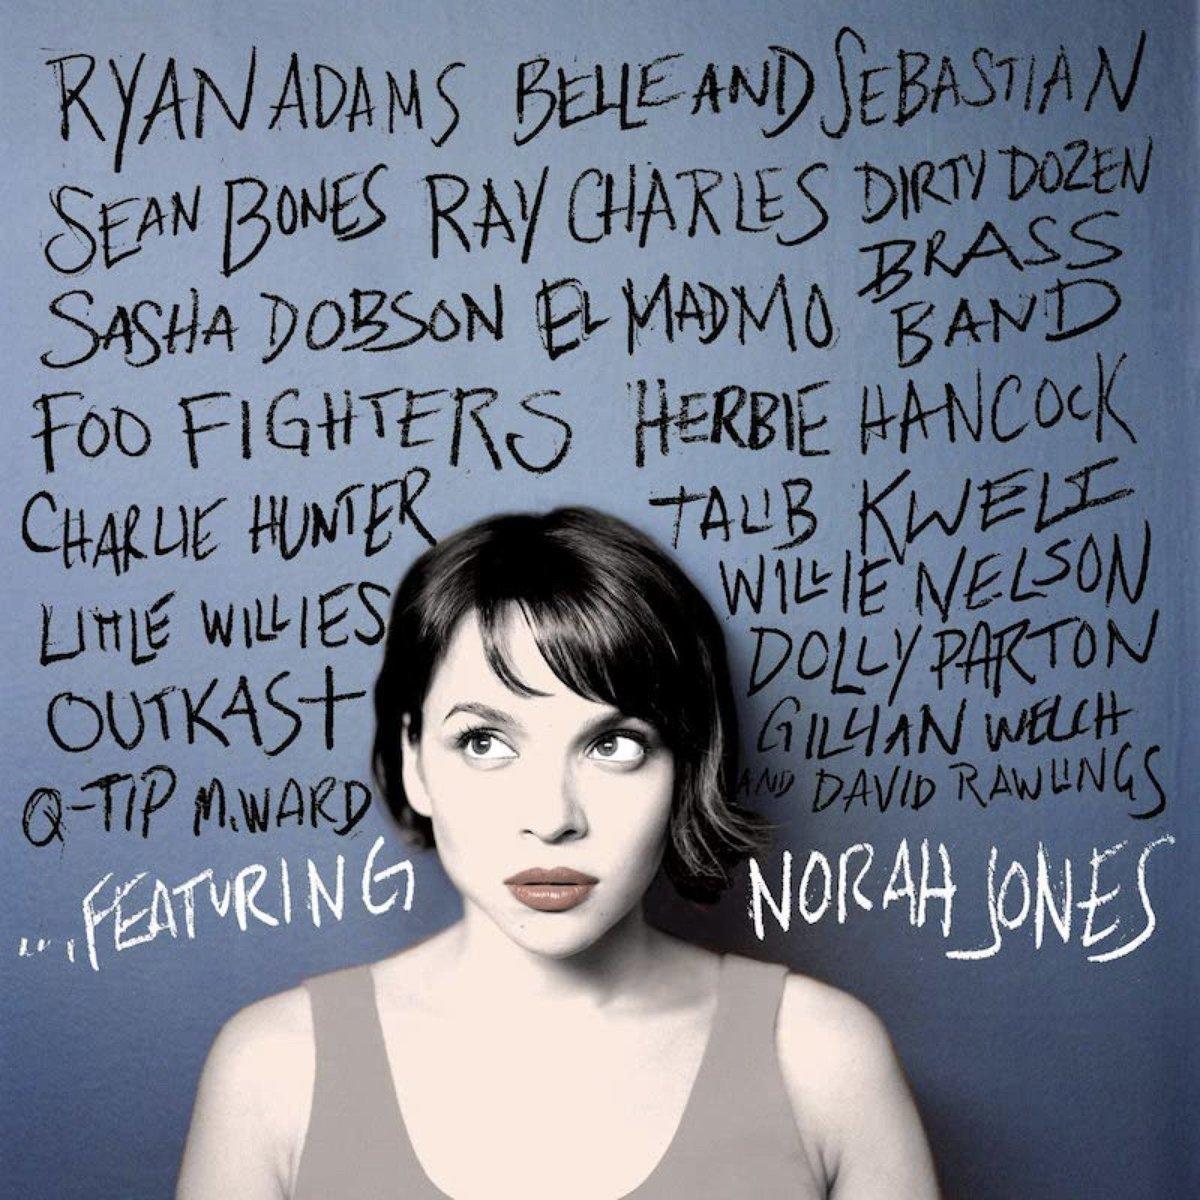 Willie Nelson feat. Norah Jones - Baby It's Cold Outside (Album: ...Featuring Norah Jones) https://t.co/zxSNs0QwxL